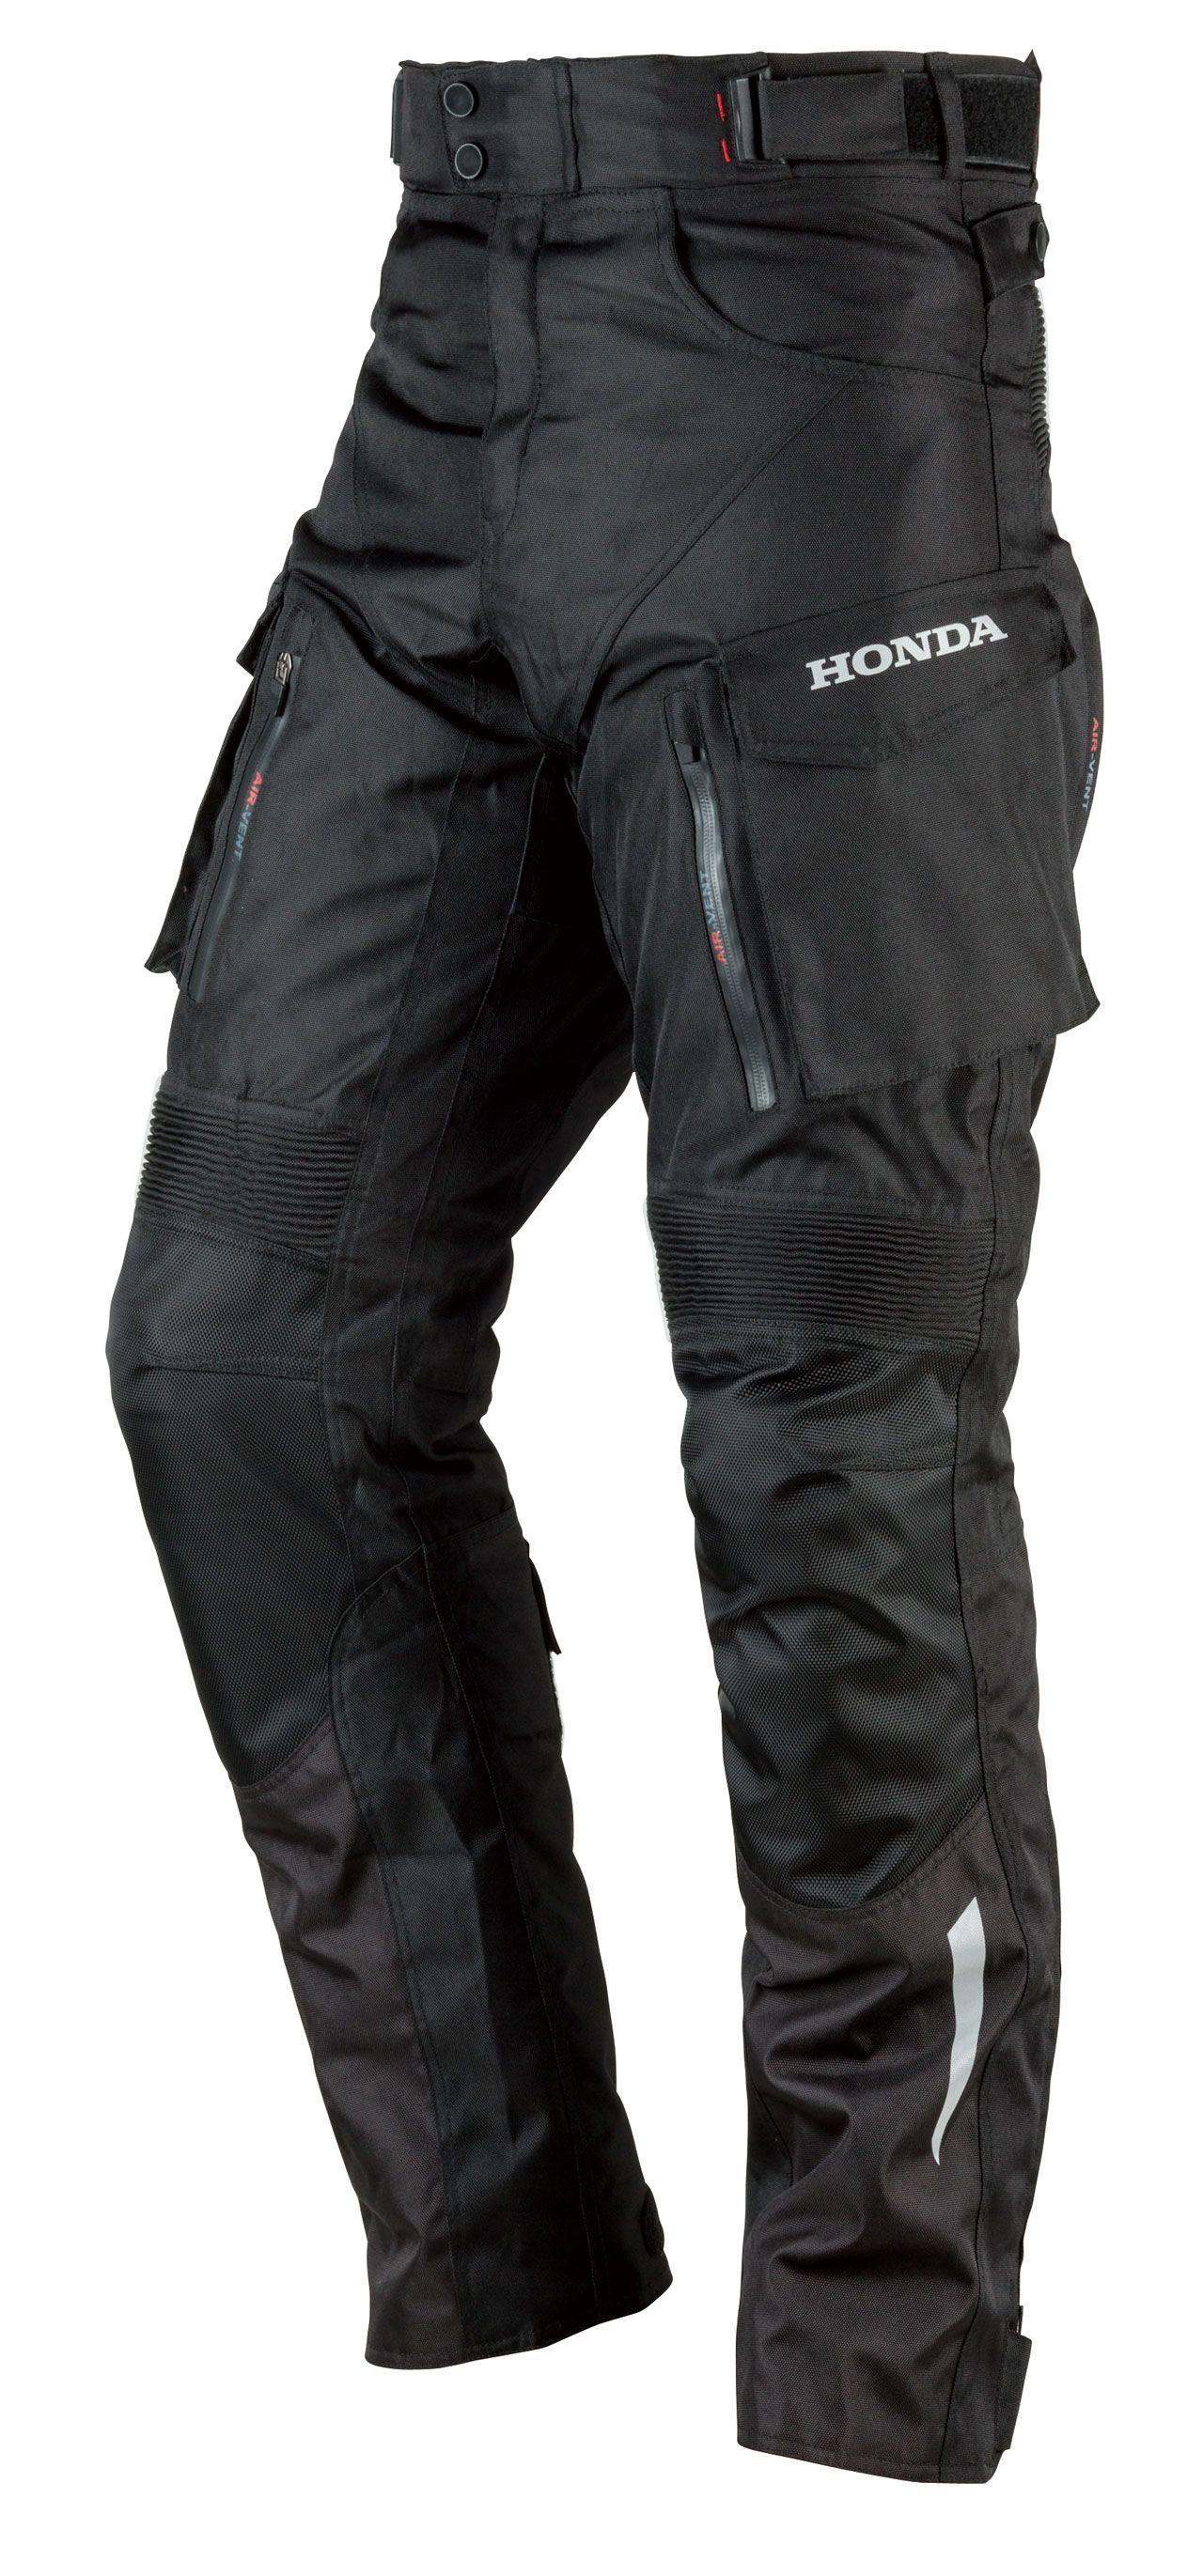 【HONDA RIDING GEAR】防護騎士冬季車褲 - 「Webike-摩托百貨」